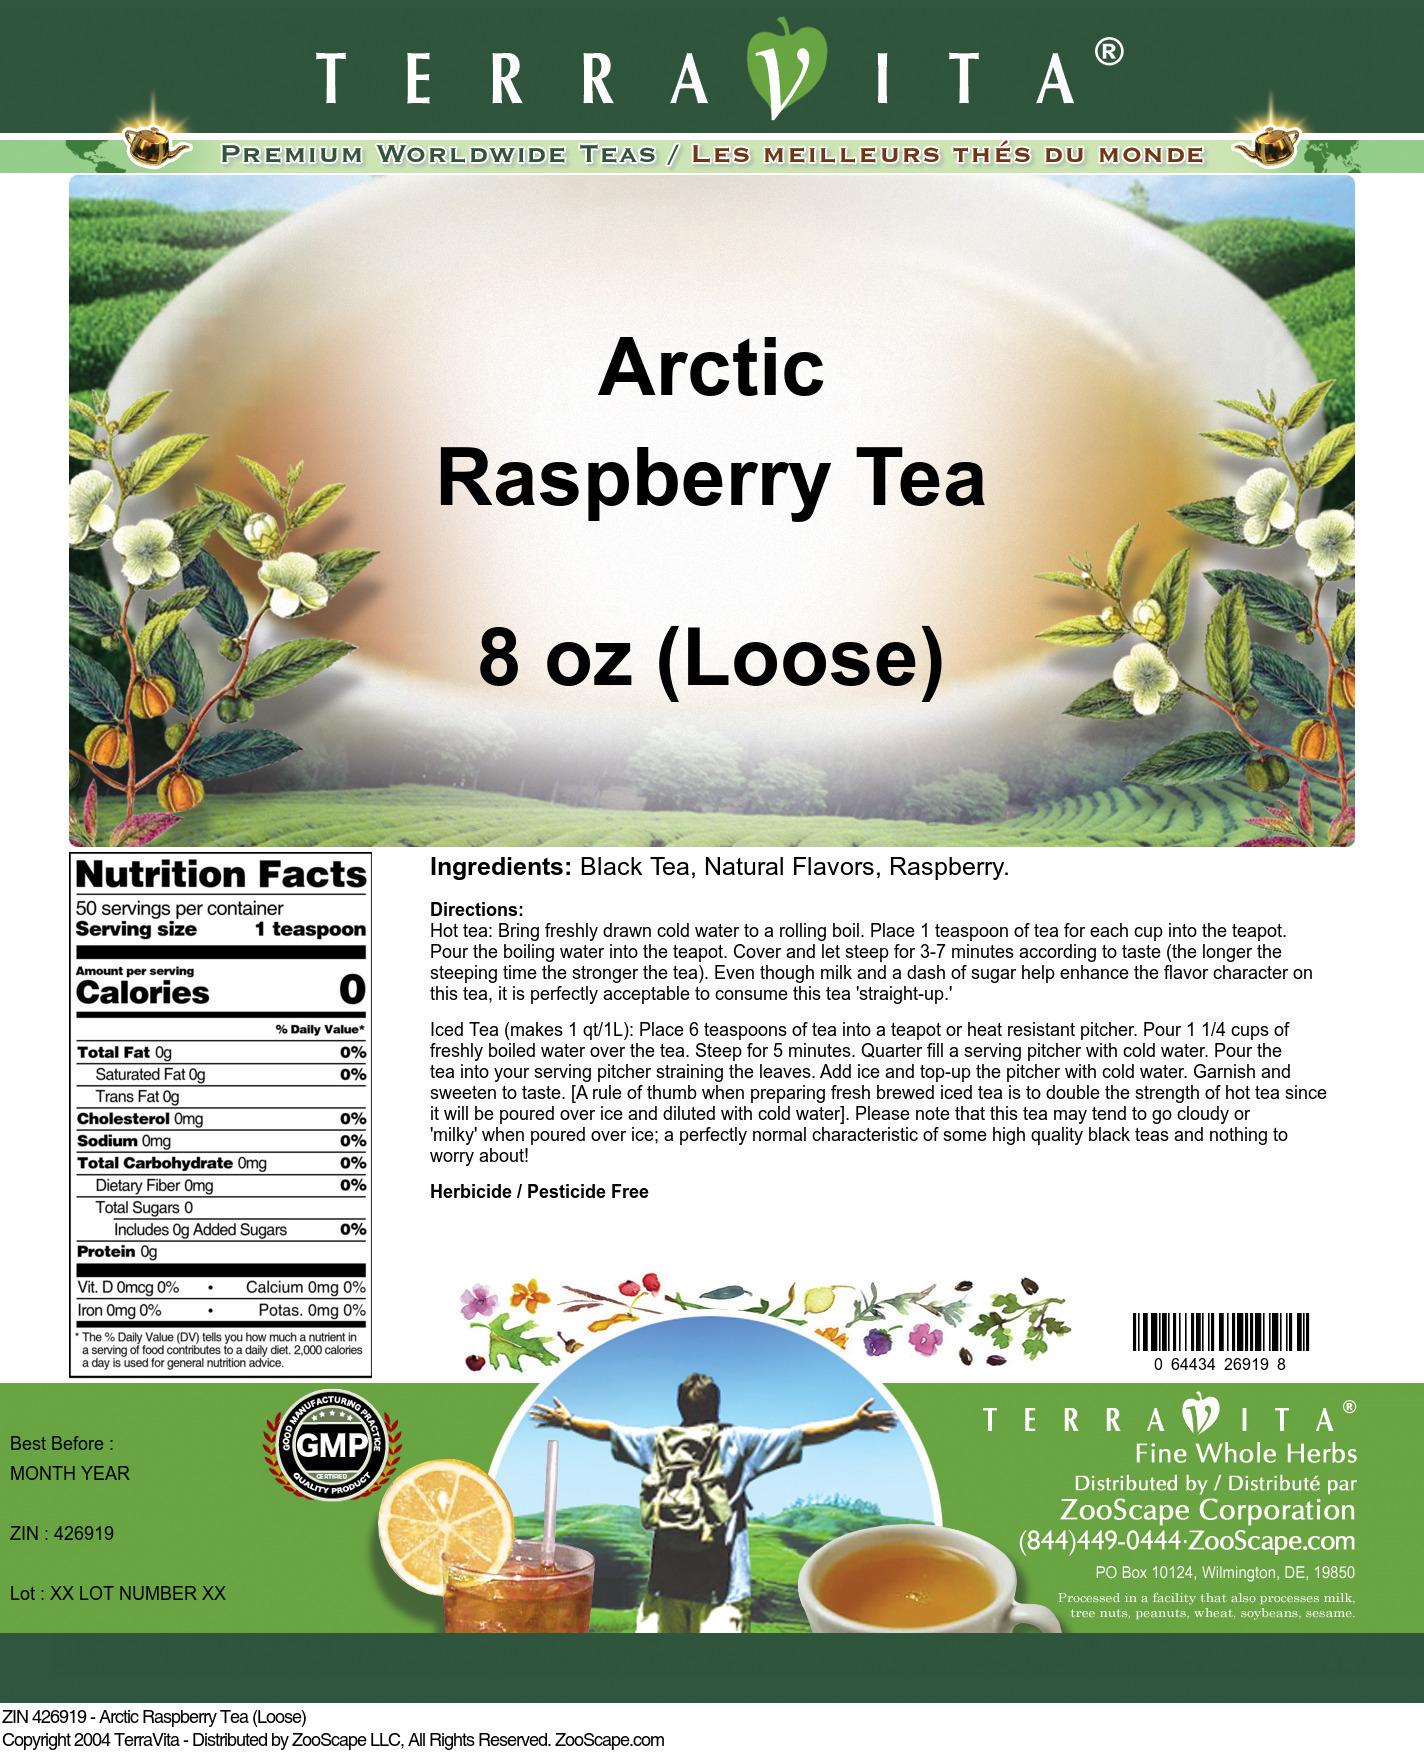 Arctic Raspberry Tea (Loose)